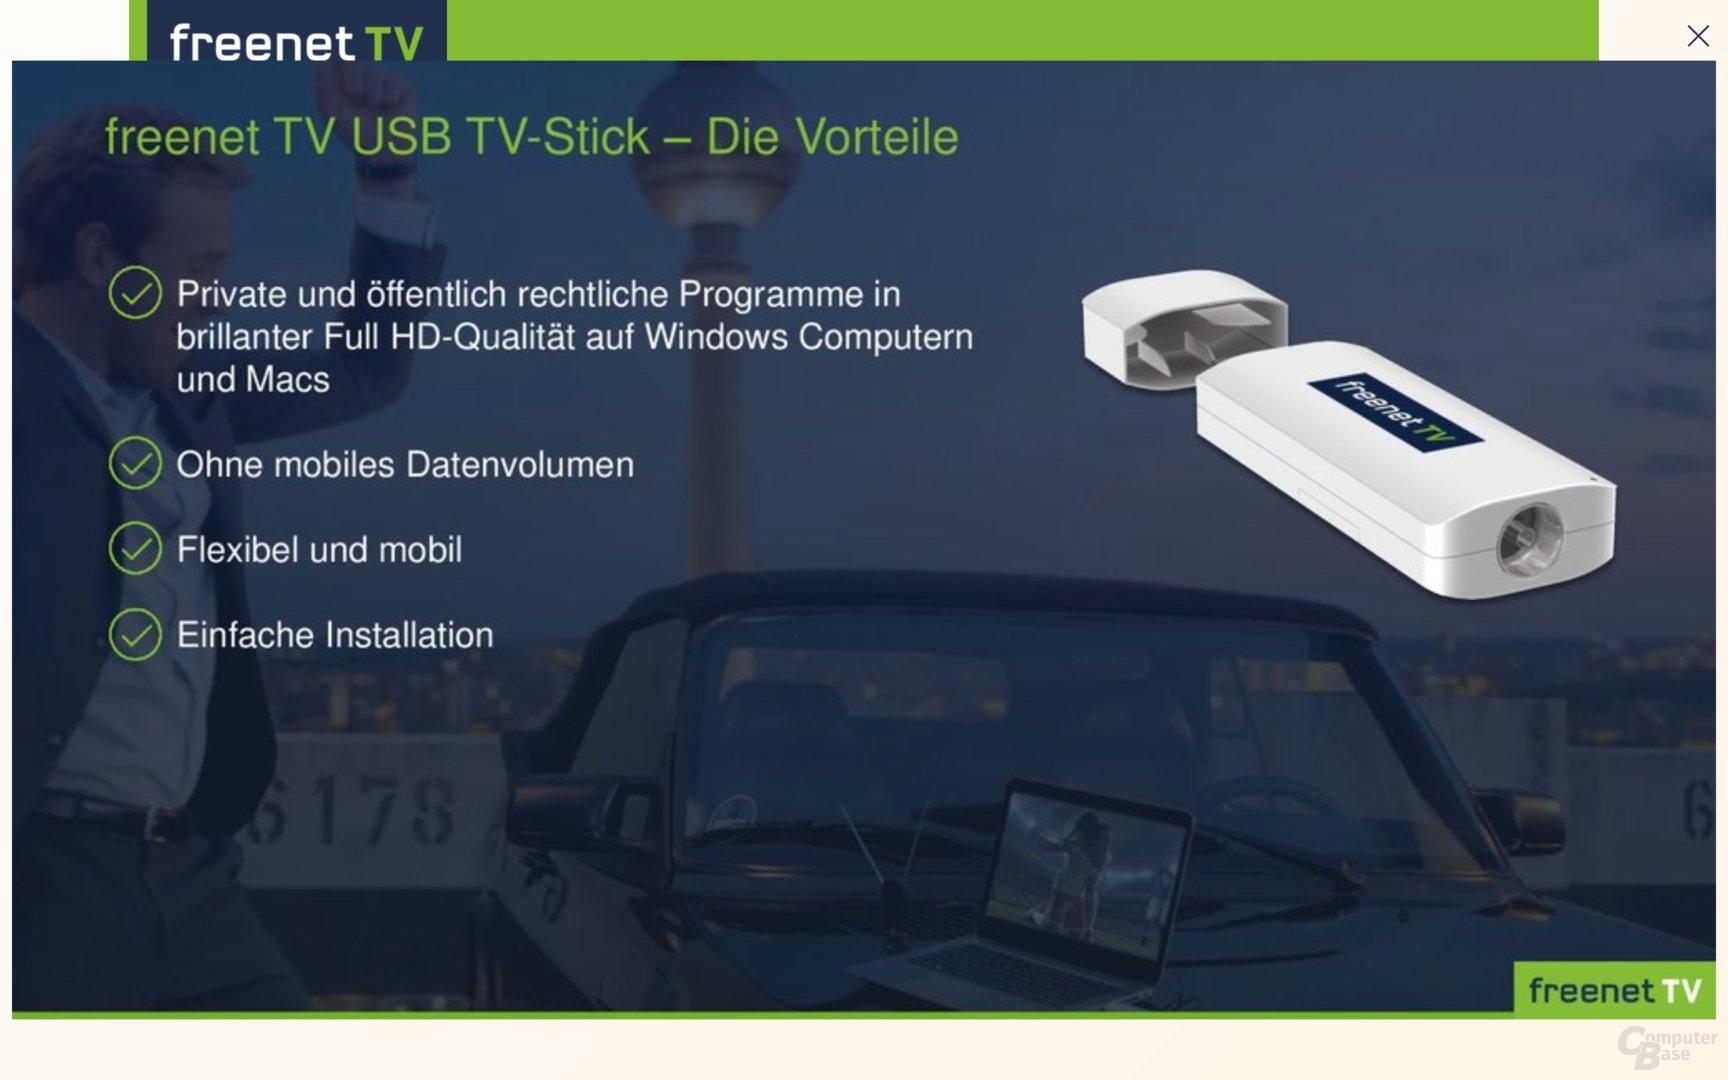 Der Freenet TV USB TV-Stick empfängt verschlüsseltes DVB-T2 HD